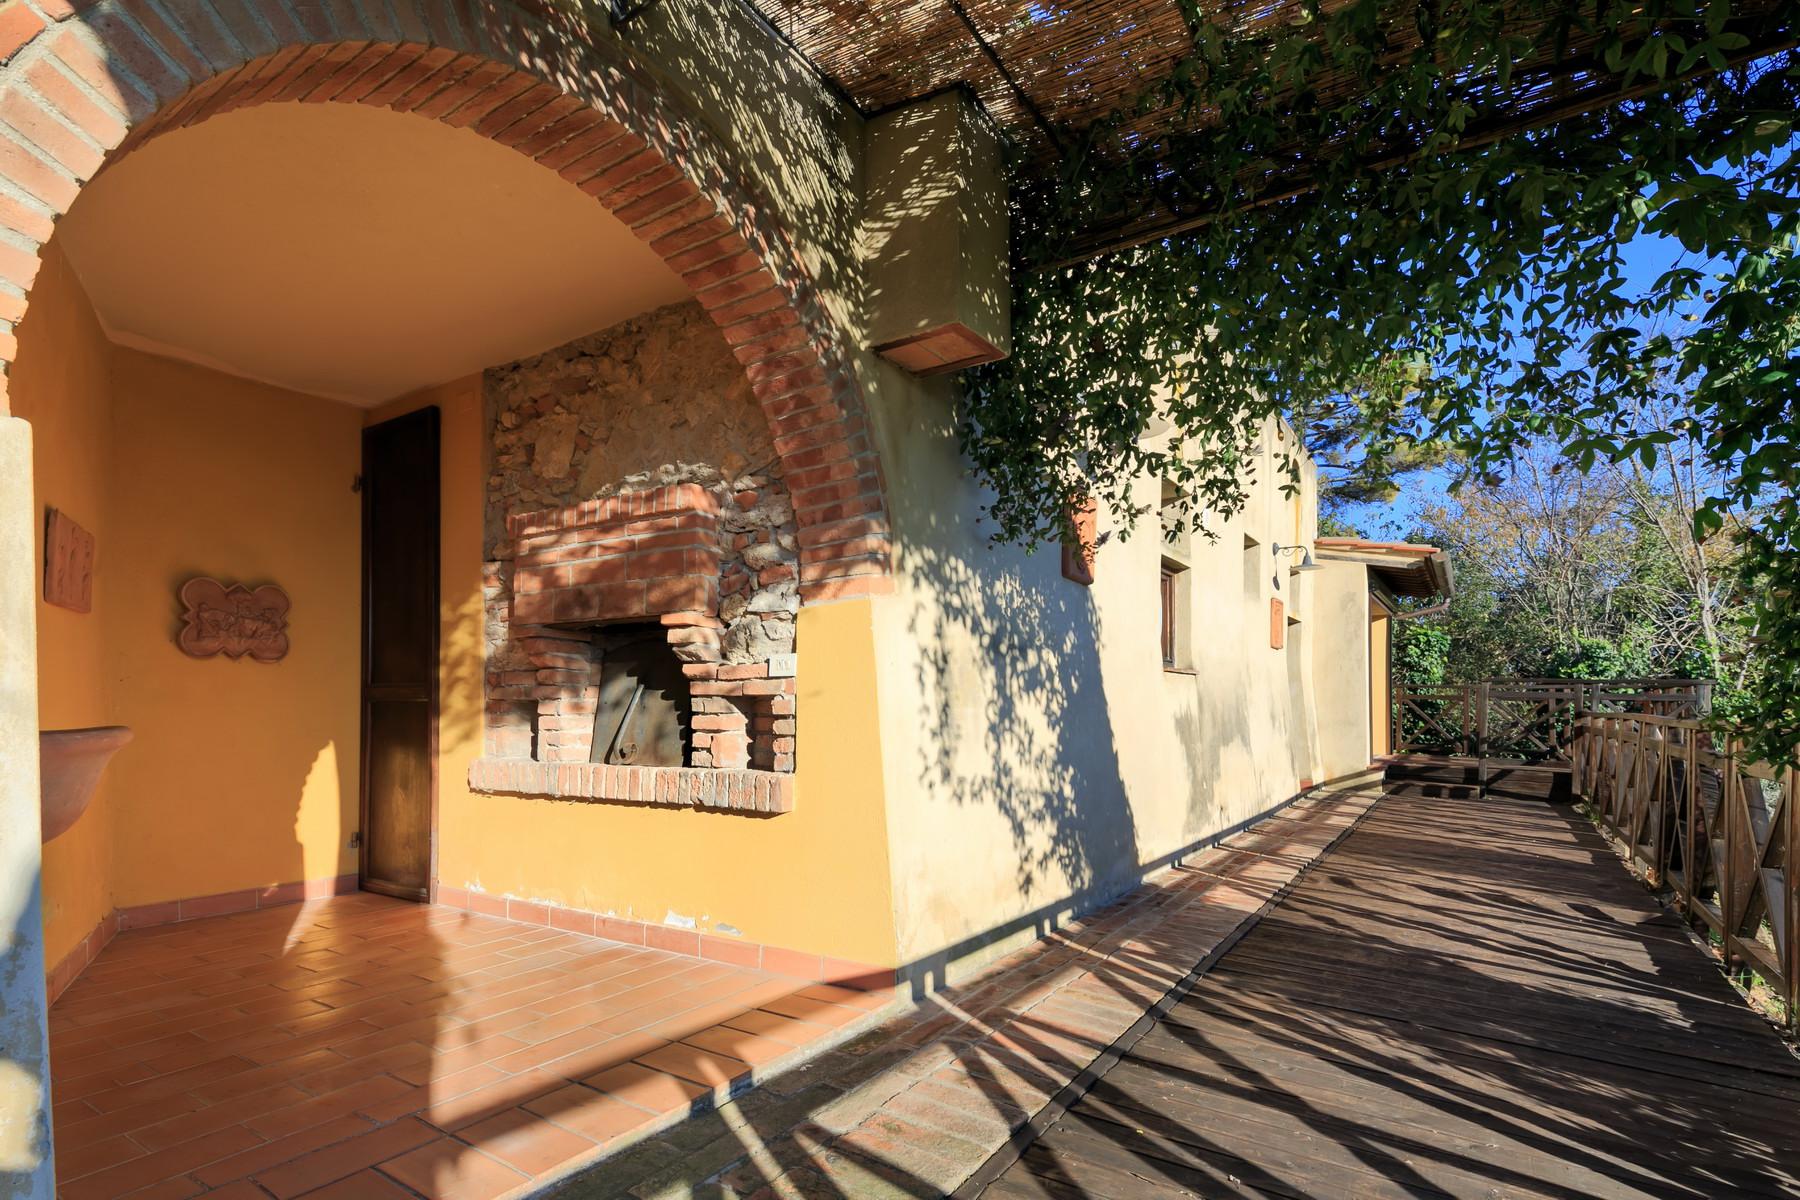 Villa in Vendita a Casciana Terme Lari: 5 locali, 550 mq - Foto 19